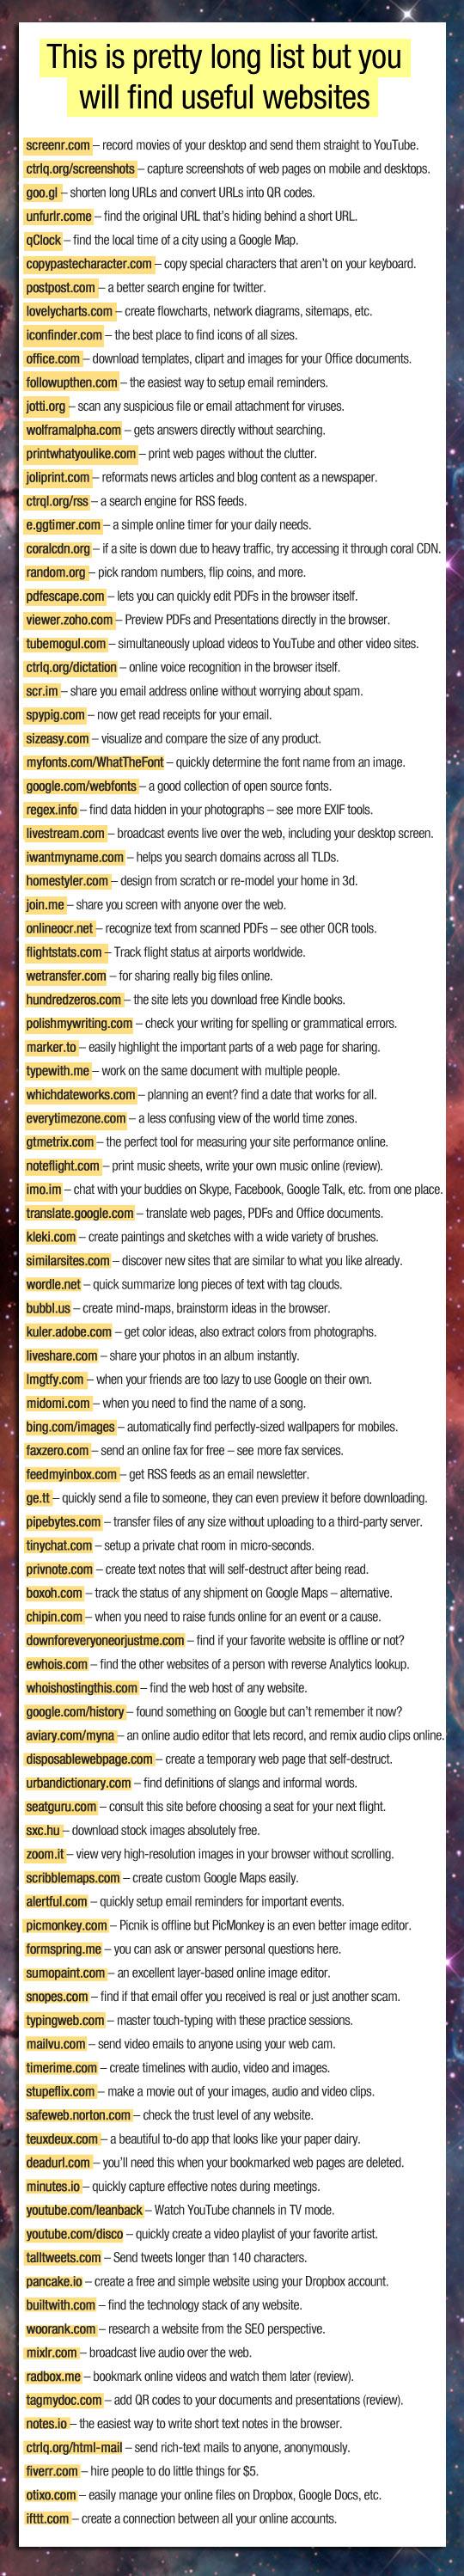 cool-list-useful-websites-Internet